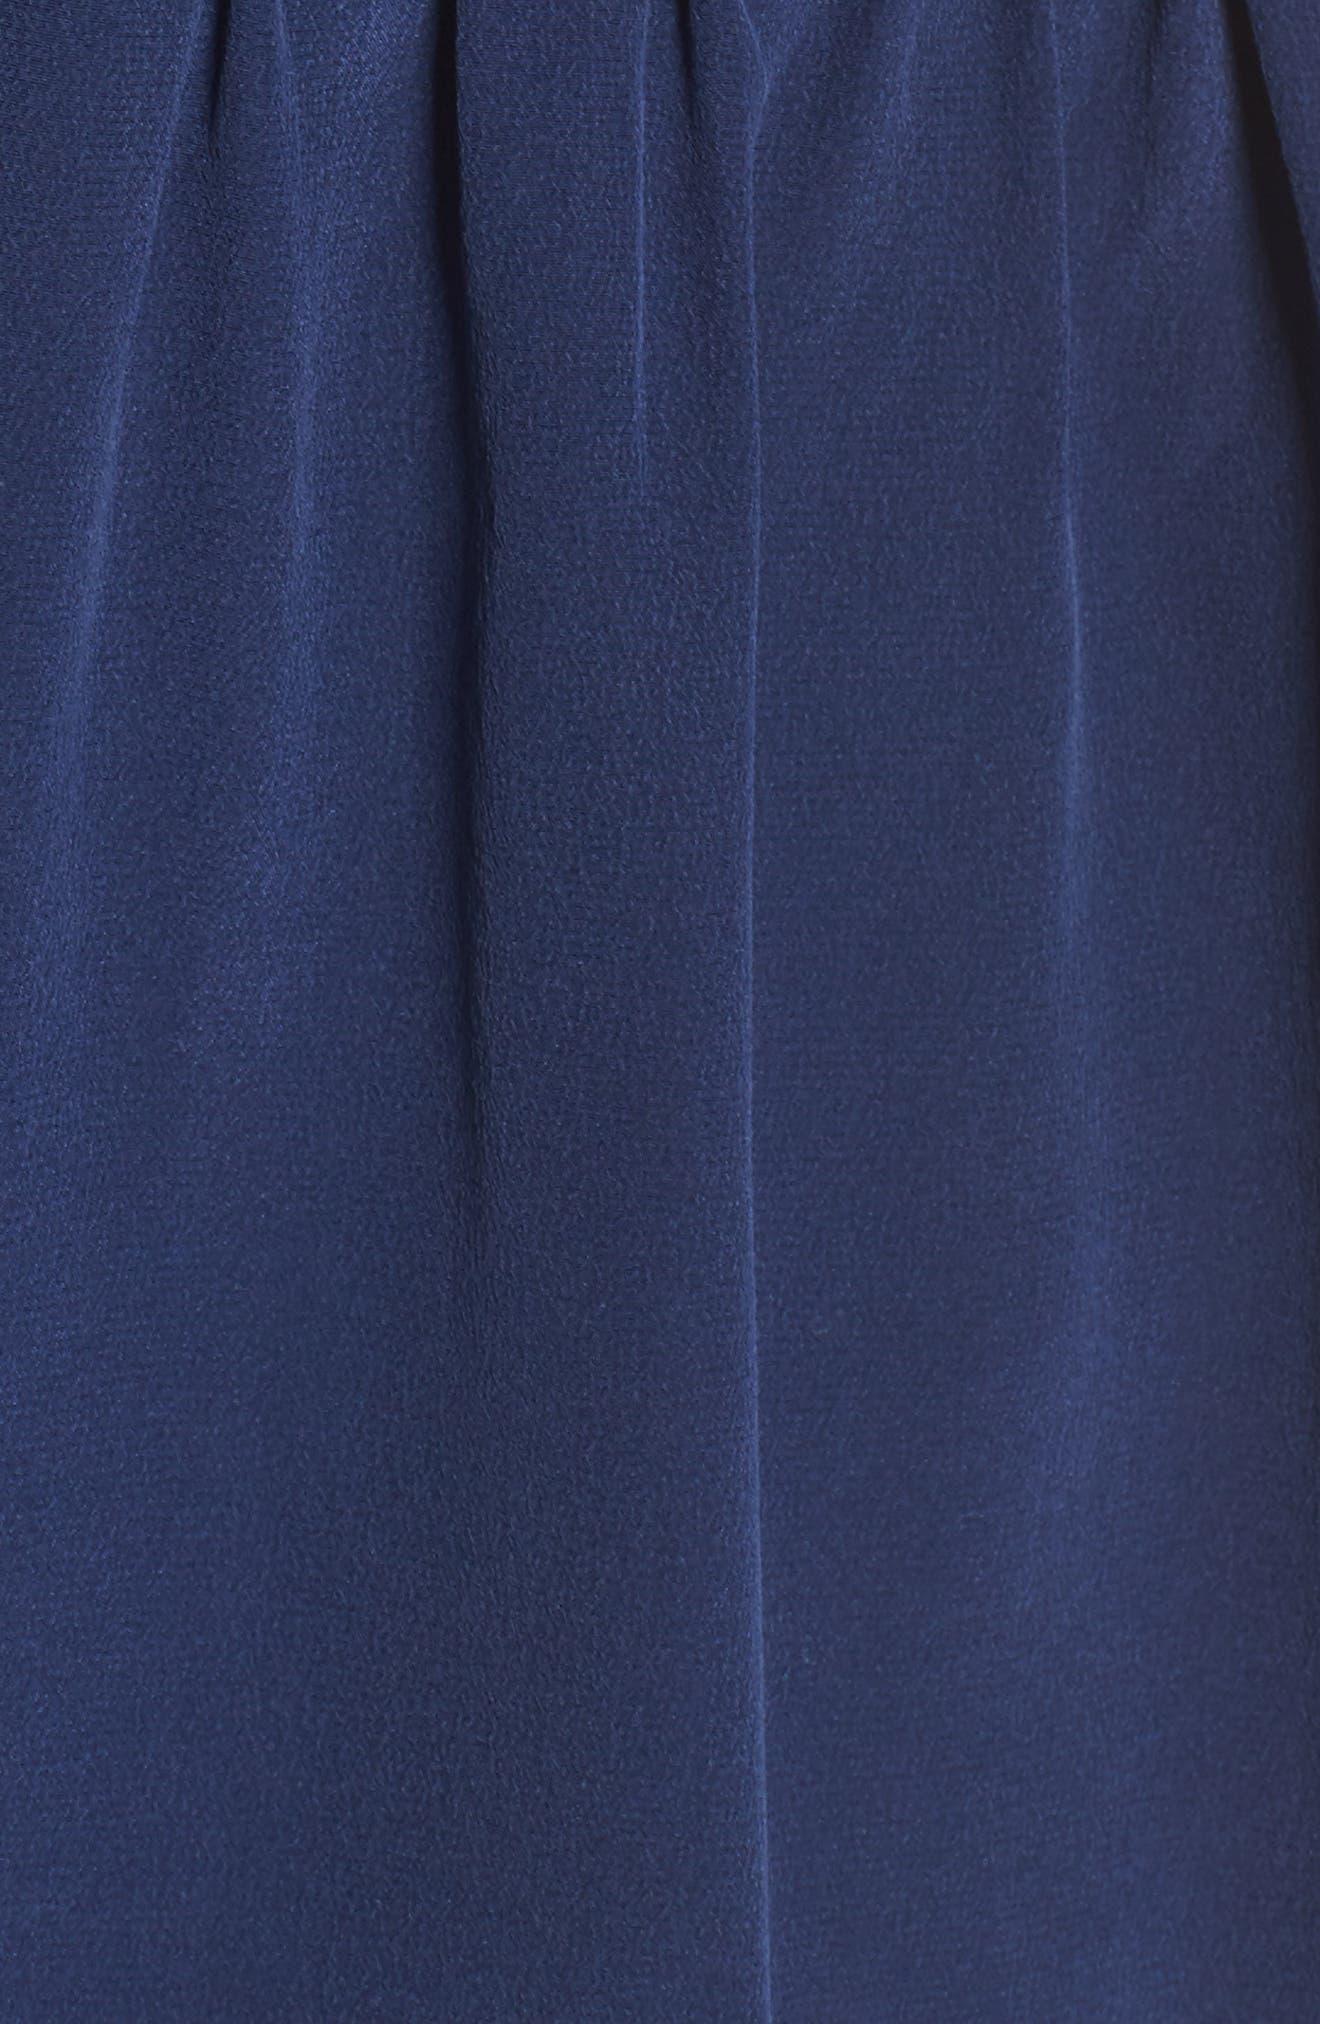 Bilson Fit & Flare Silk Dress,                             Alternate thumbnail 5, color,                             410